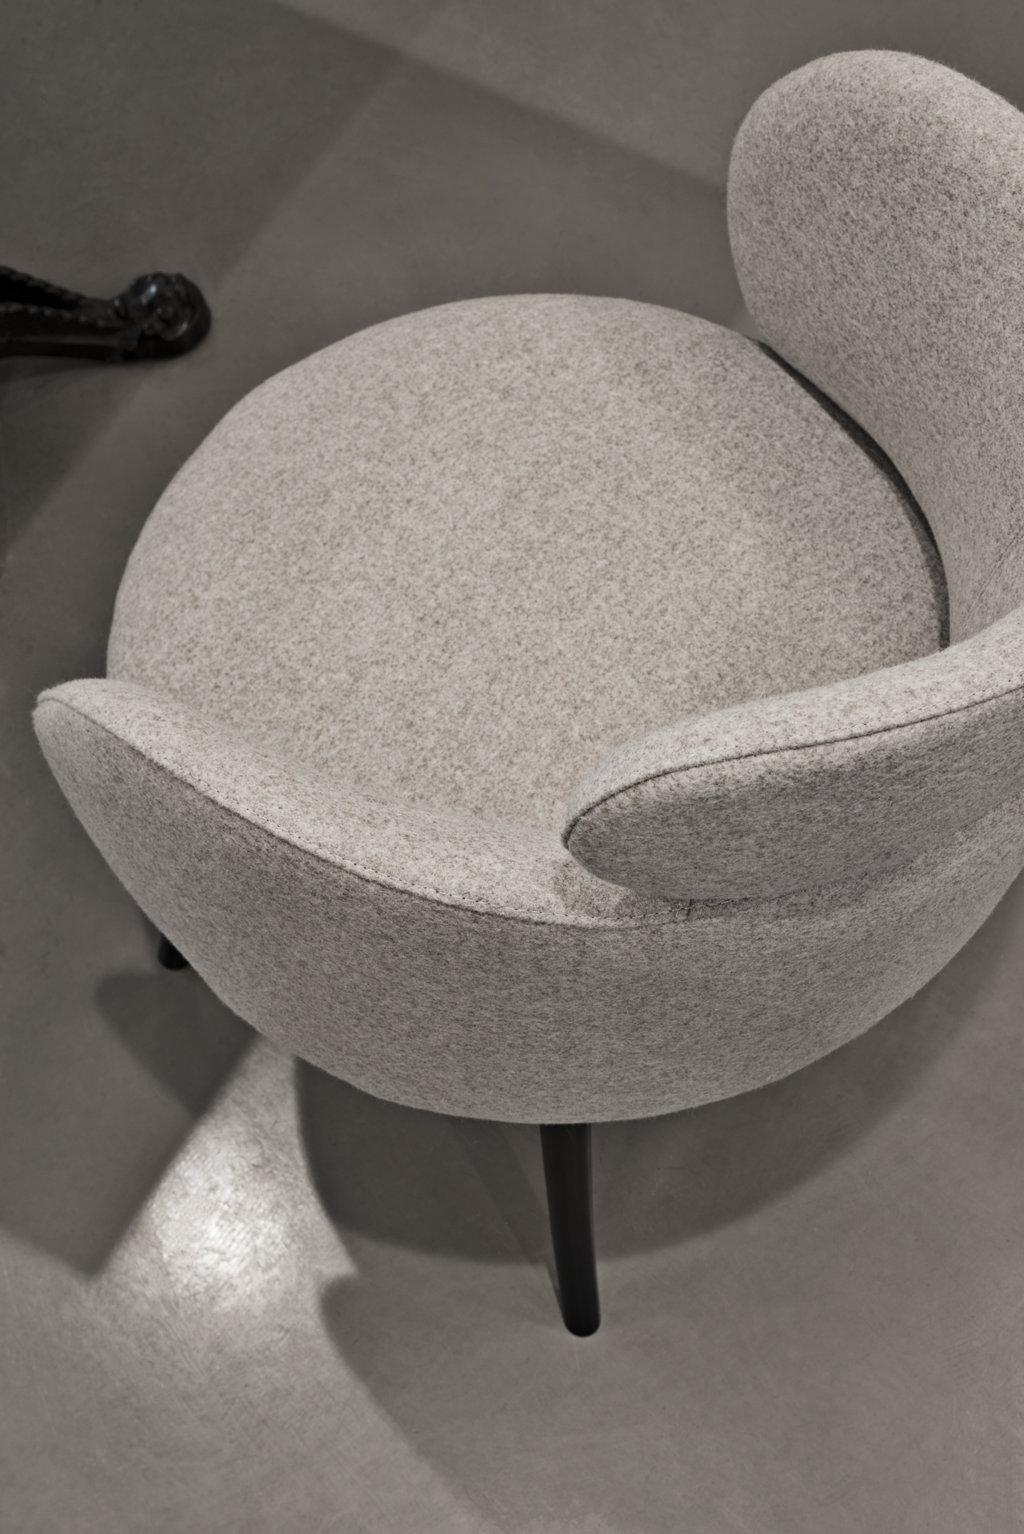 Gebrüder Thonet Vienna Обеденный стул «Malit»